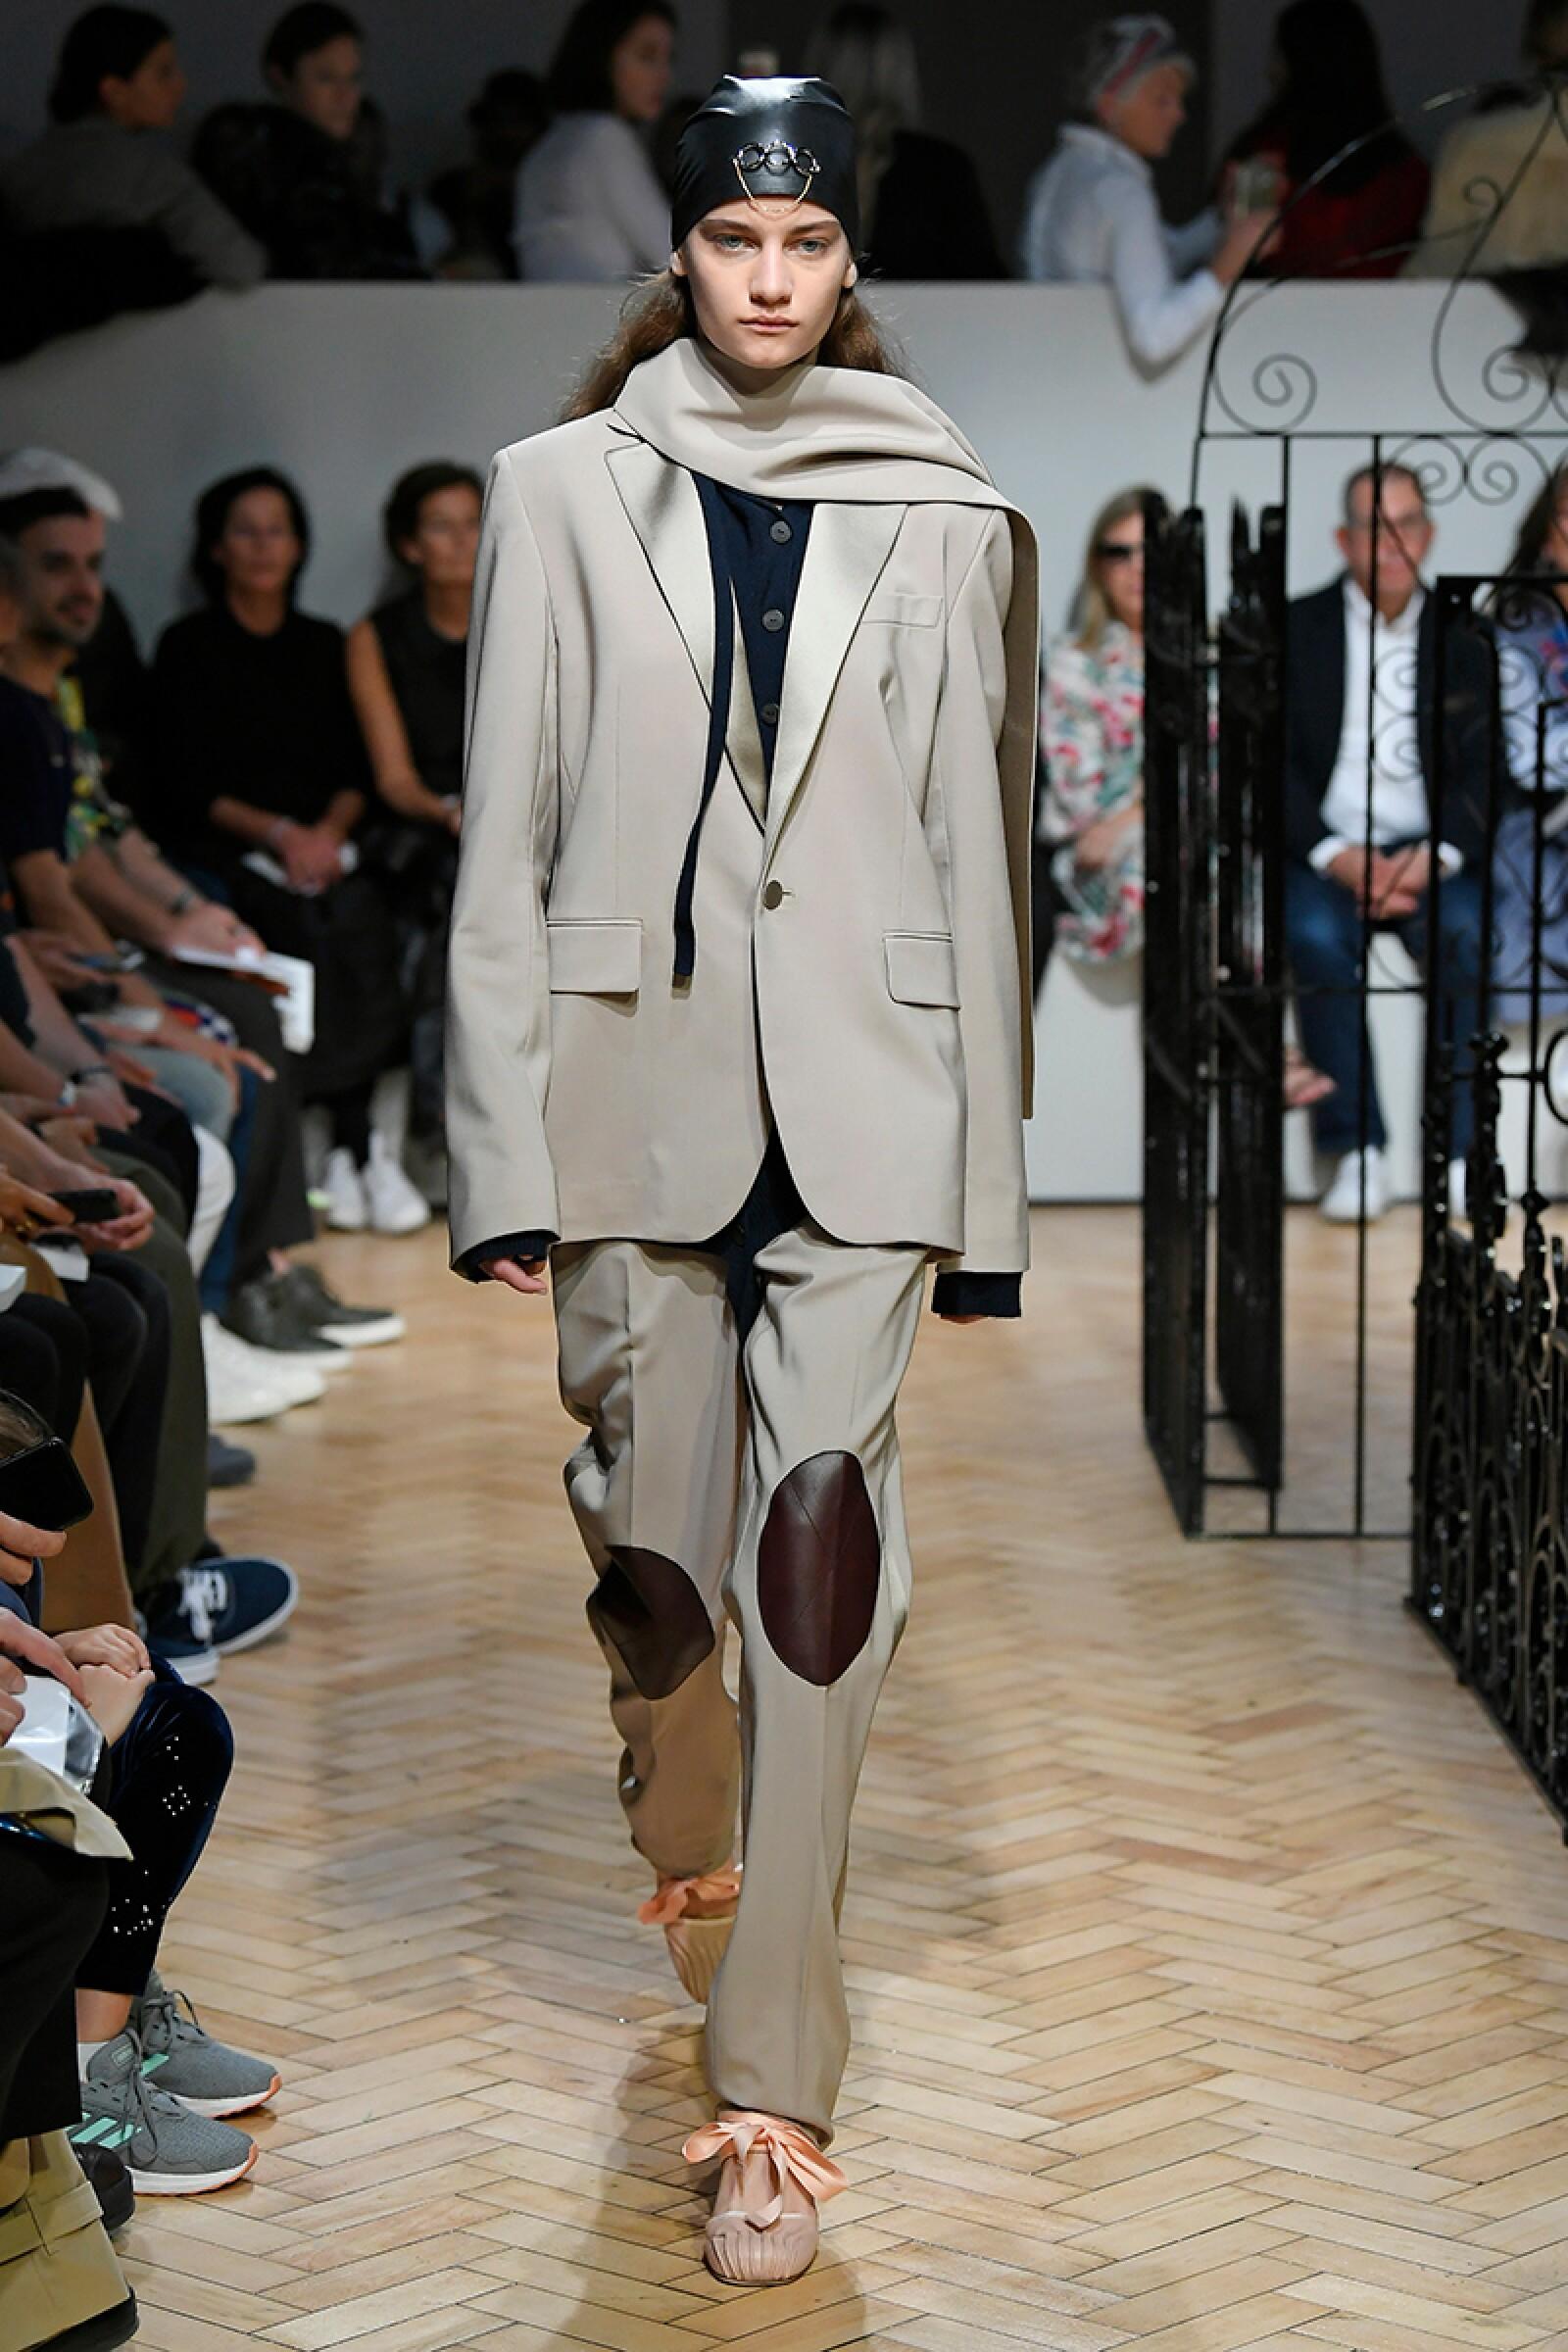 JW Anderson show, Runway, Spring Summer 2019, London Fashion Week, UK - 15 Sep 2018